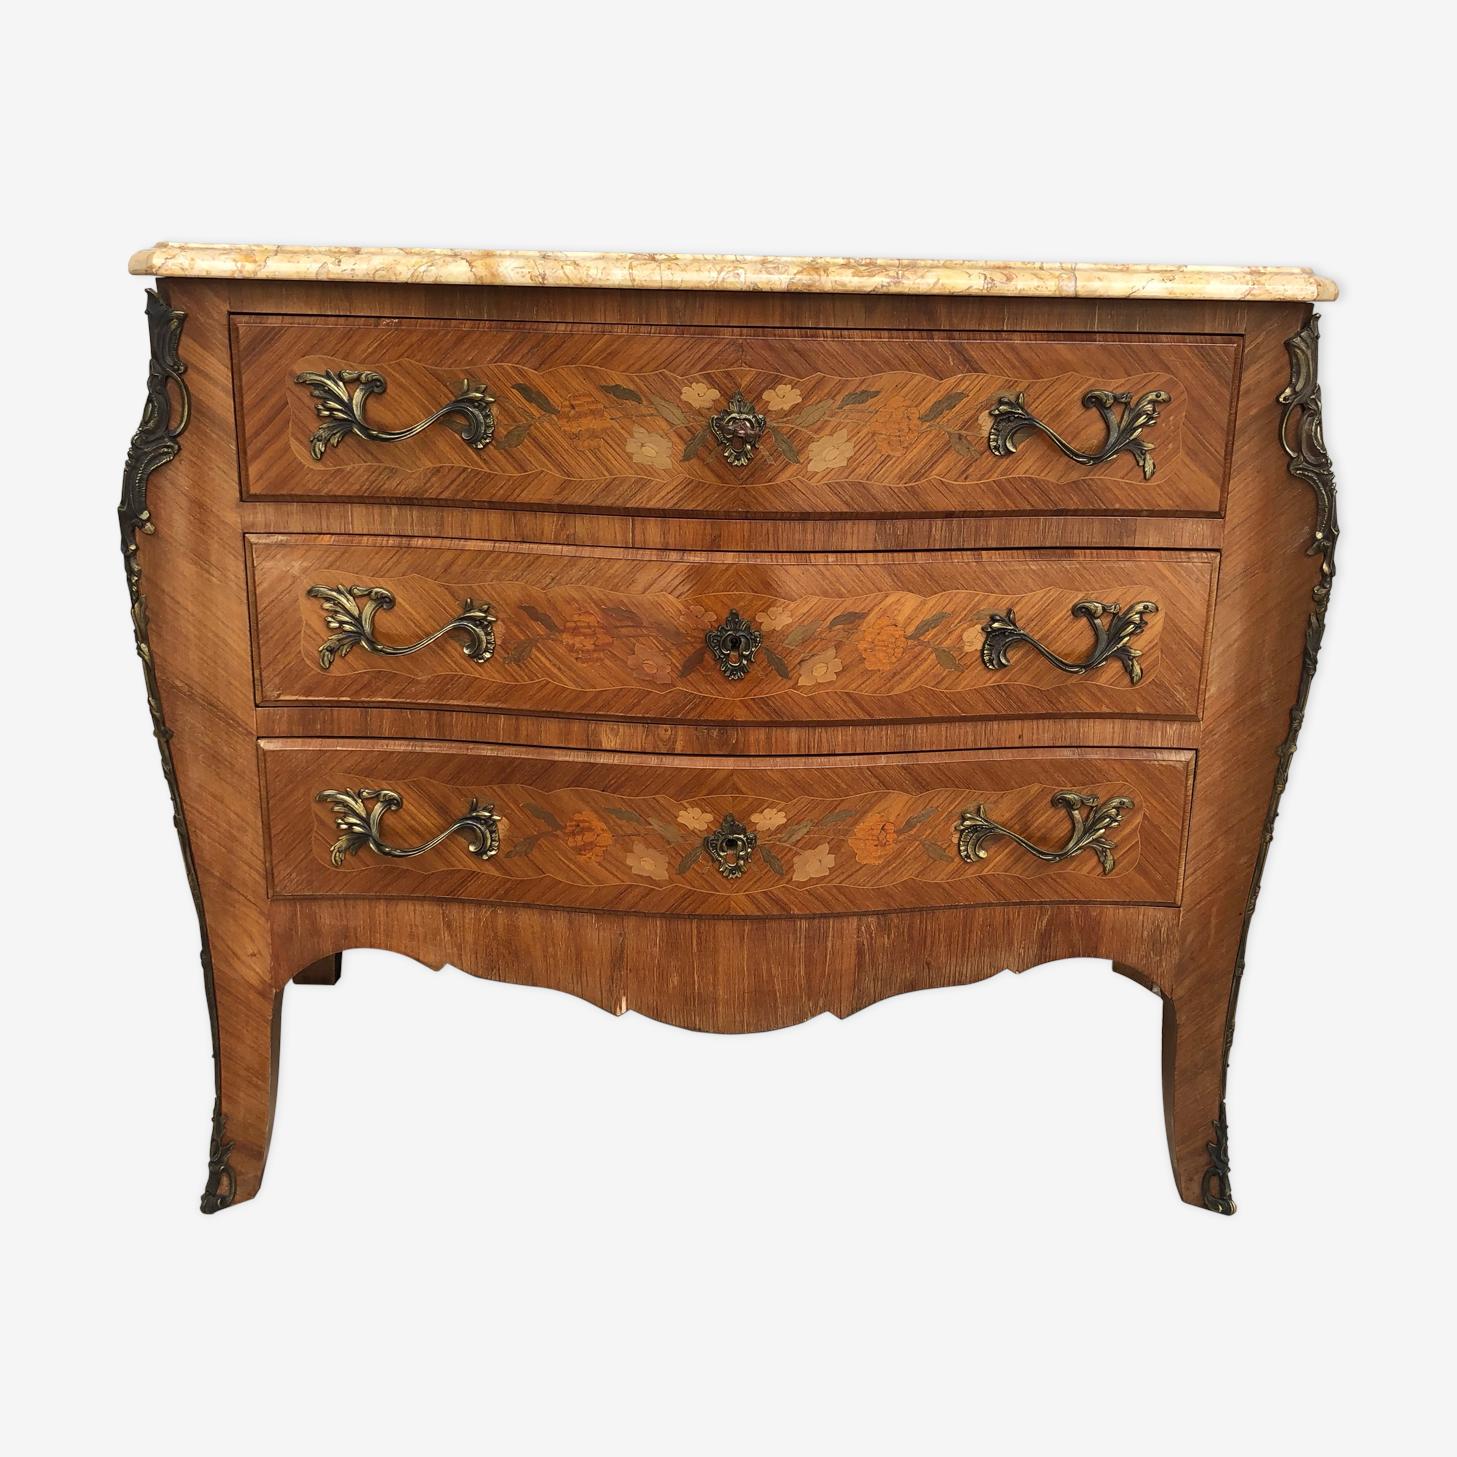 Commode galbée en marqueterie style Louis XV